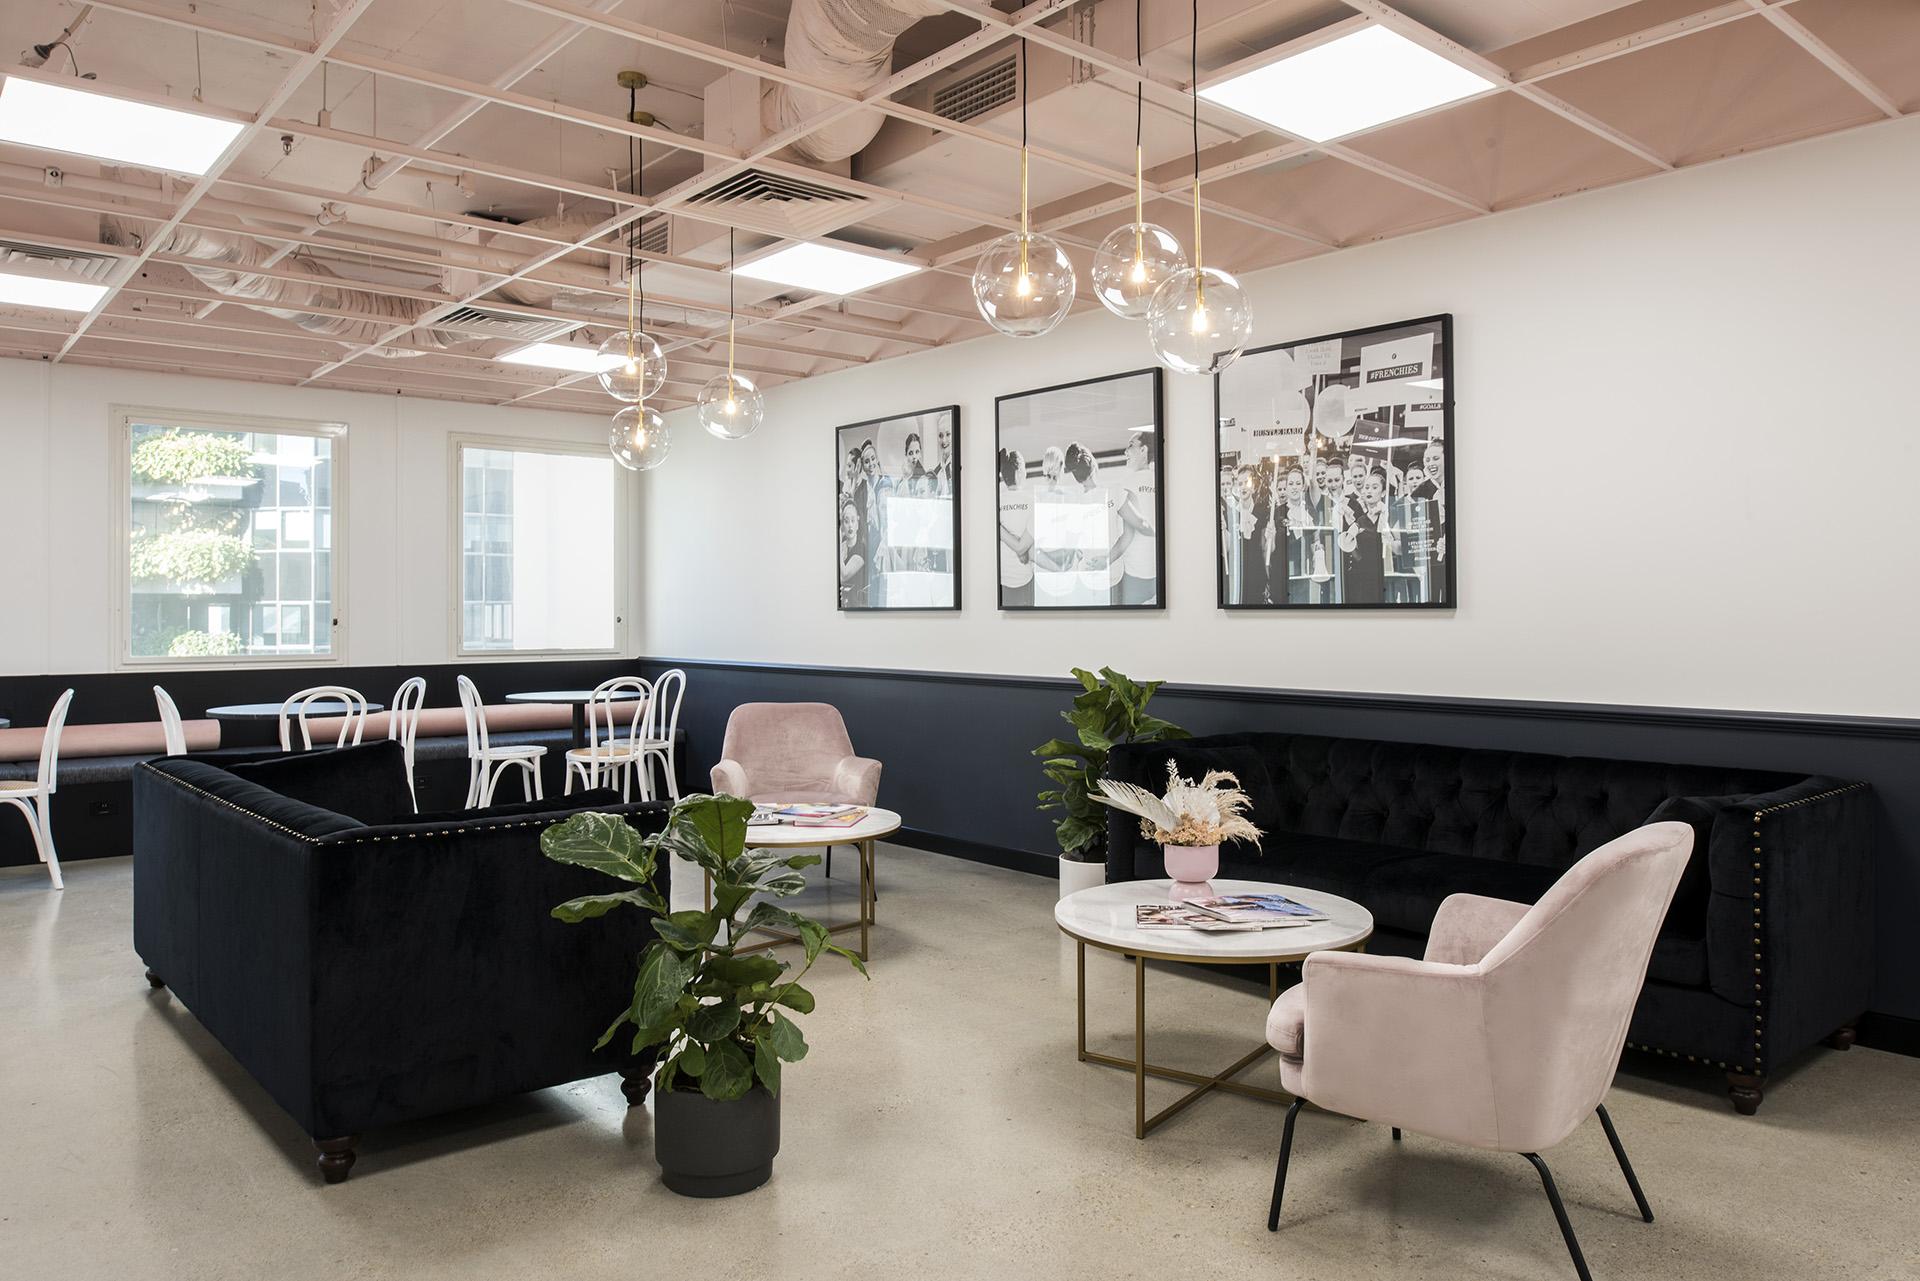 Archway-French Office Design Brisbane- Breakout Space 2.jpg